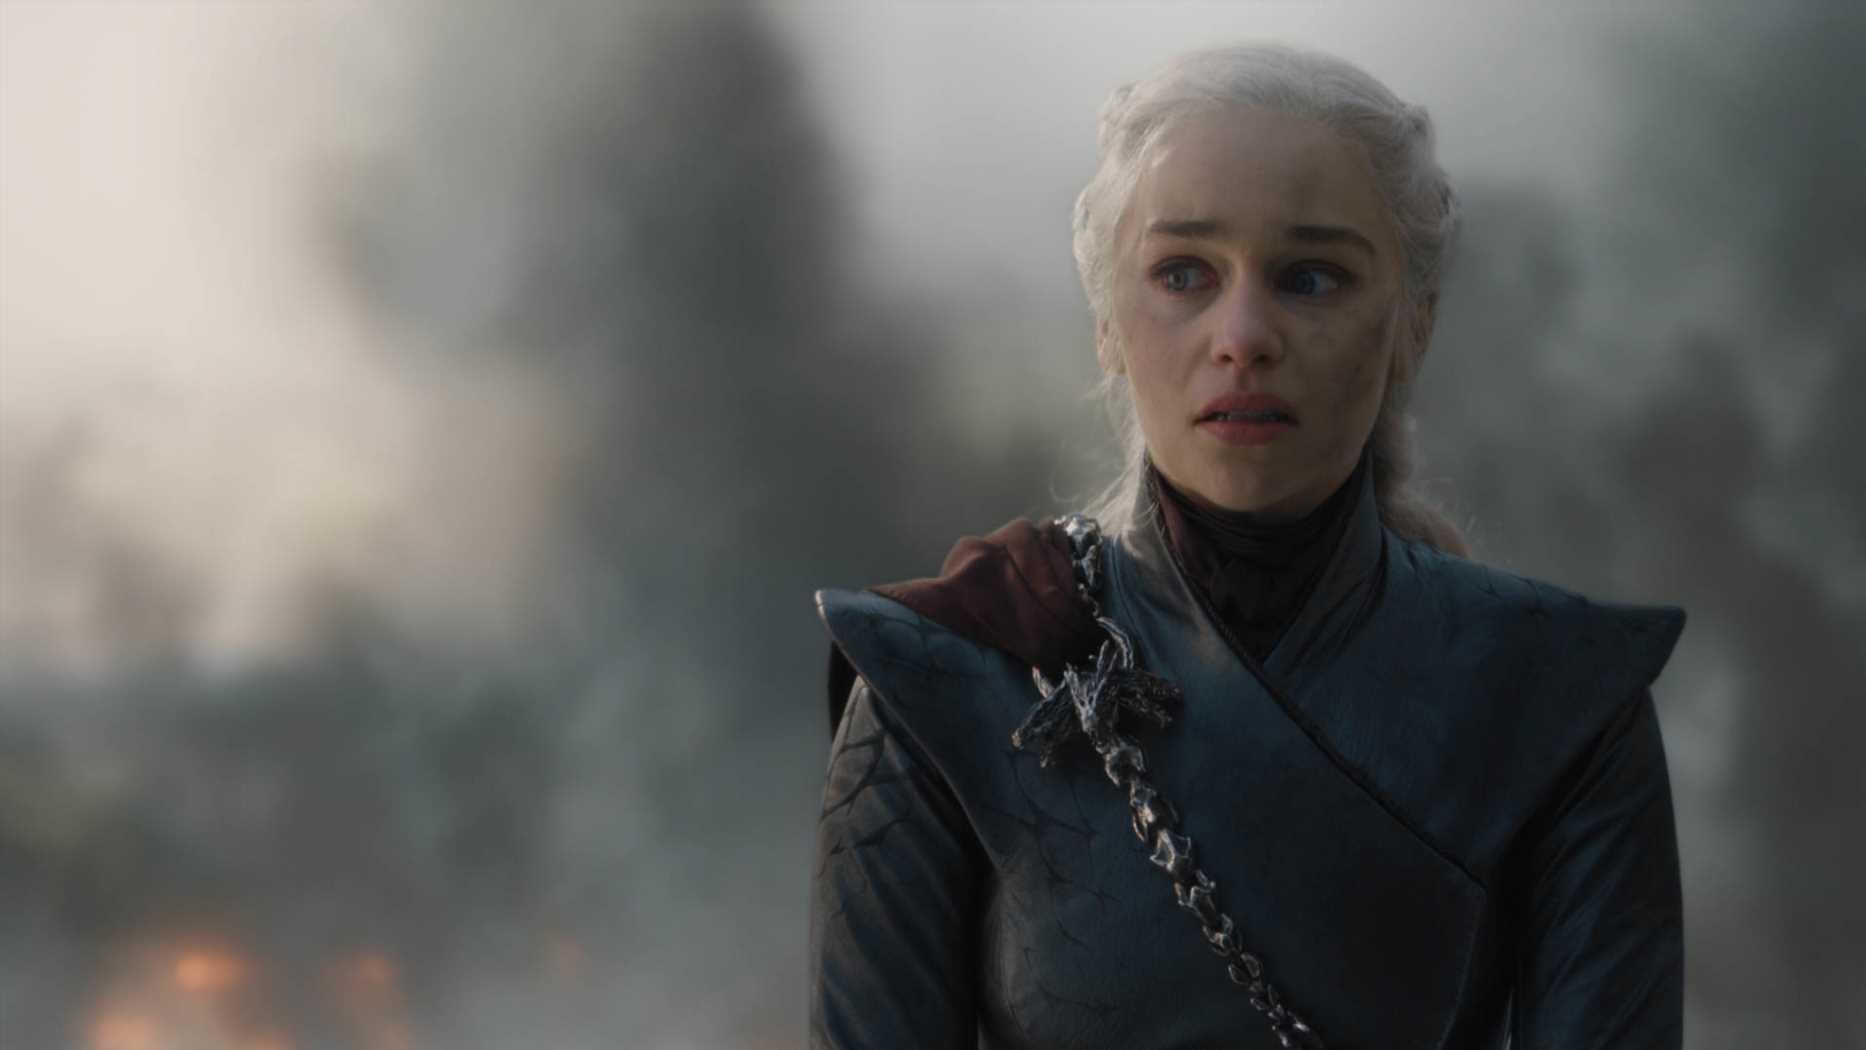 HBO Preparing 'Game of Thrones' Targaryen Prequel Series From George R.R. Martin — Report